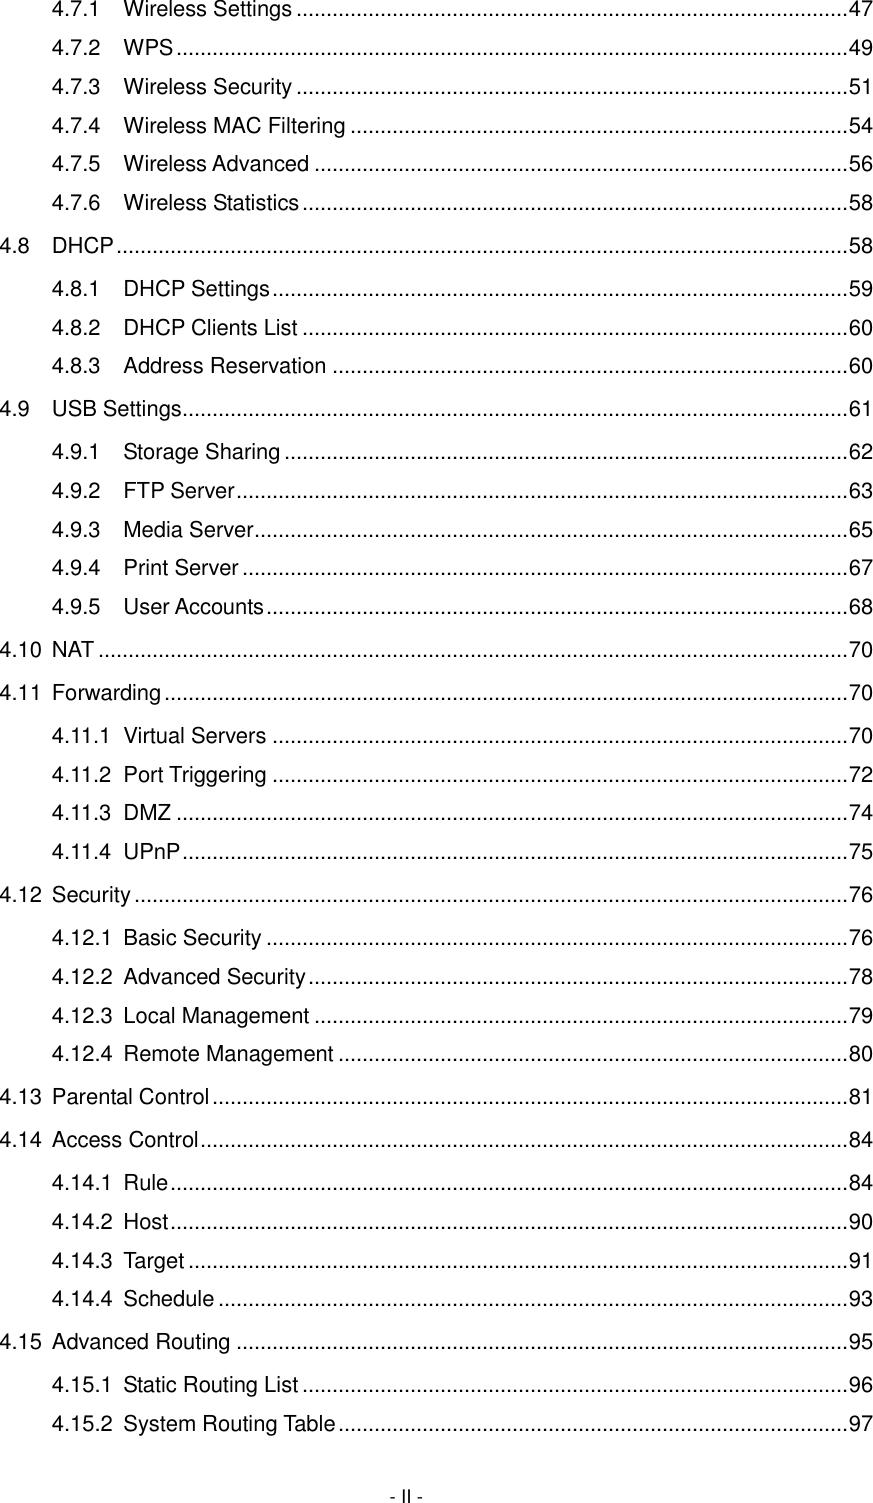 tp link tl wdr4300 manual